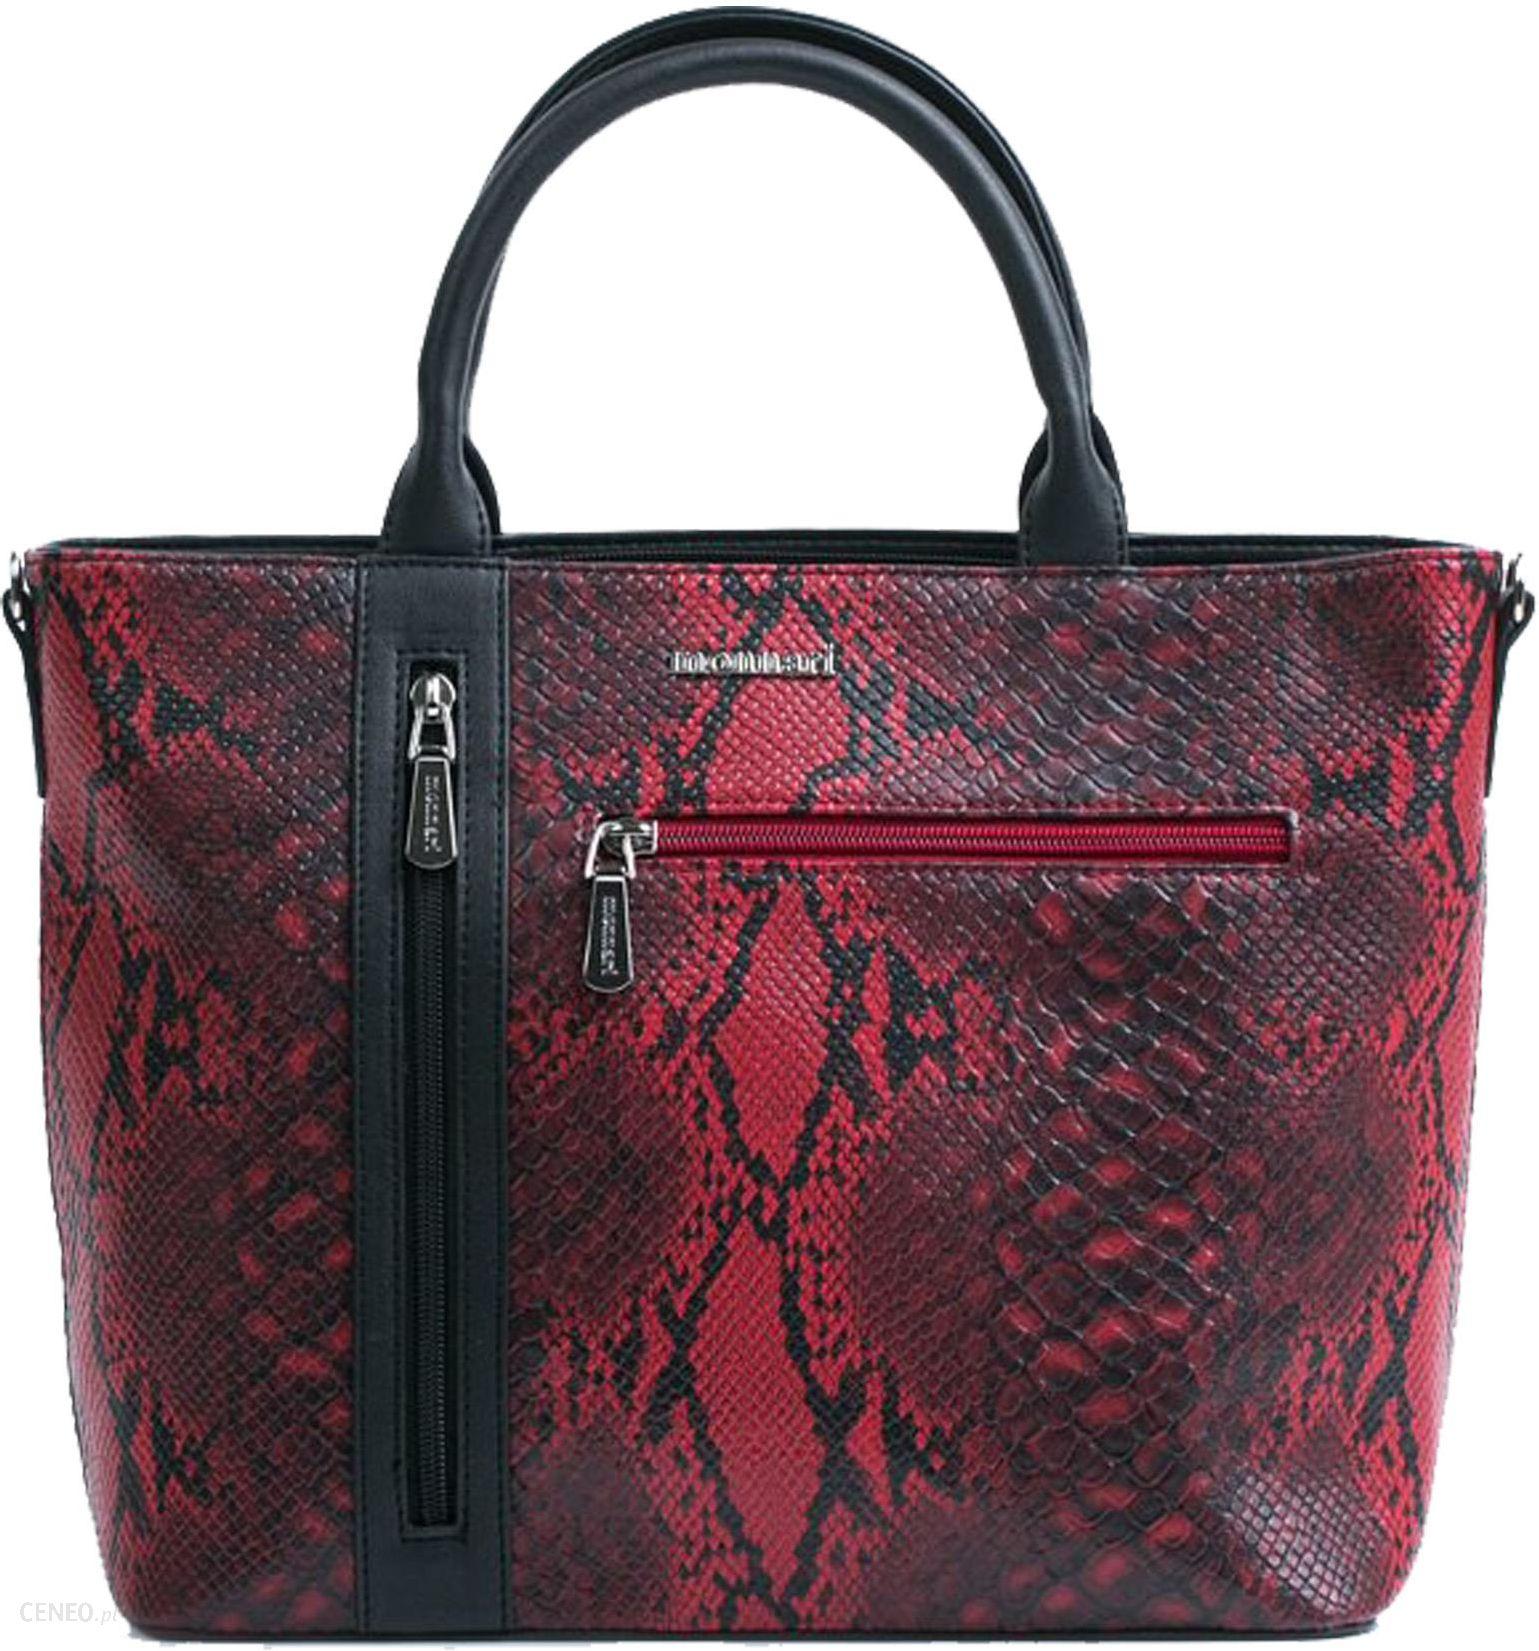 2a5b18ac47bb6 Torebka Monnari Handbag BAGB540-005 czerwona - Ceny i opinie - Ceneo.pl